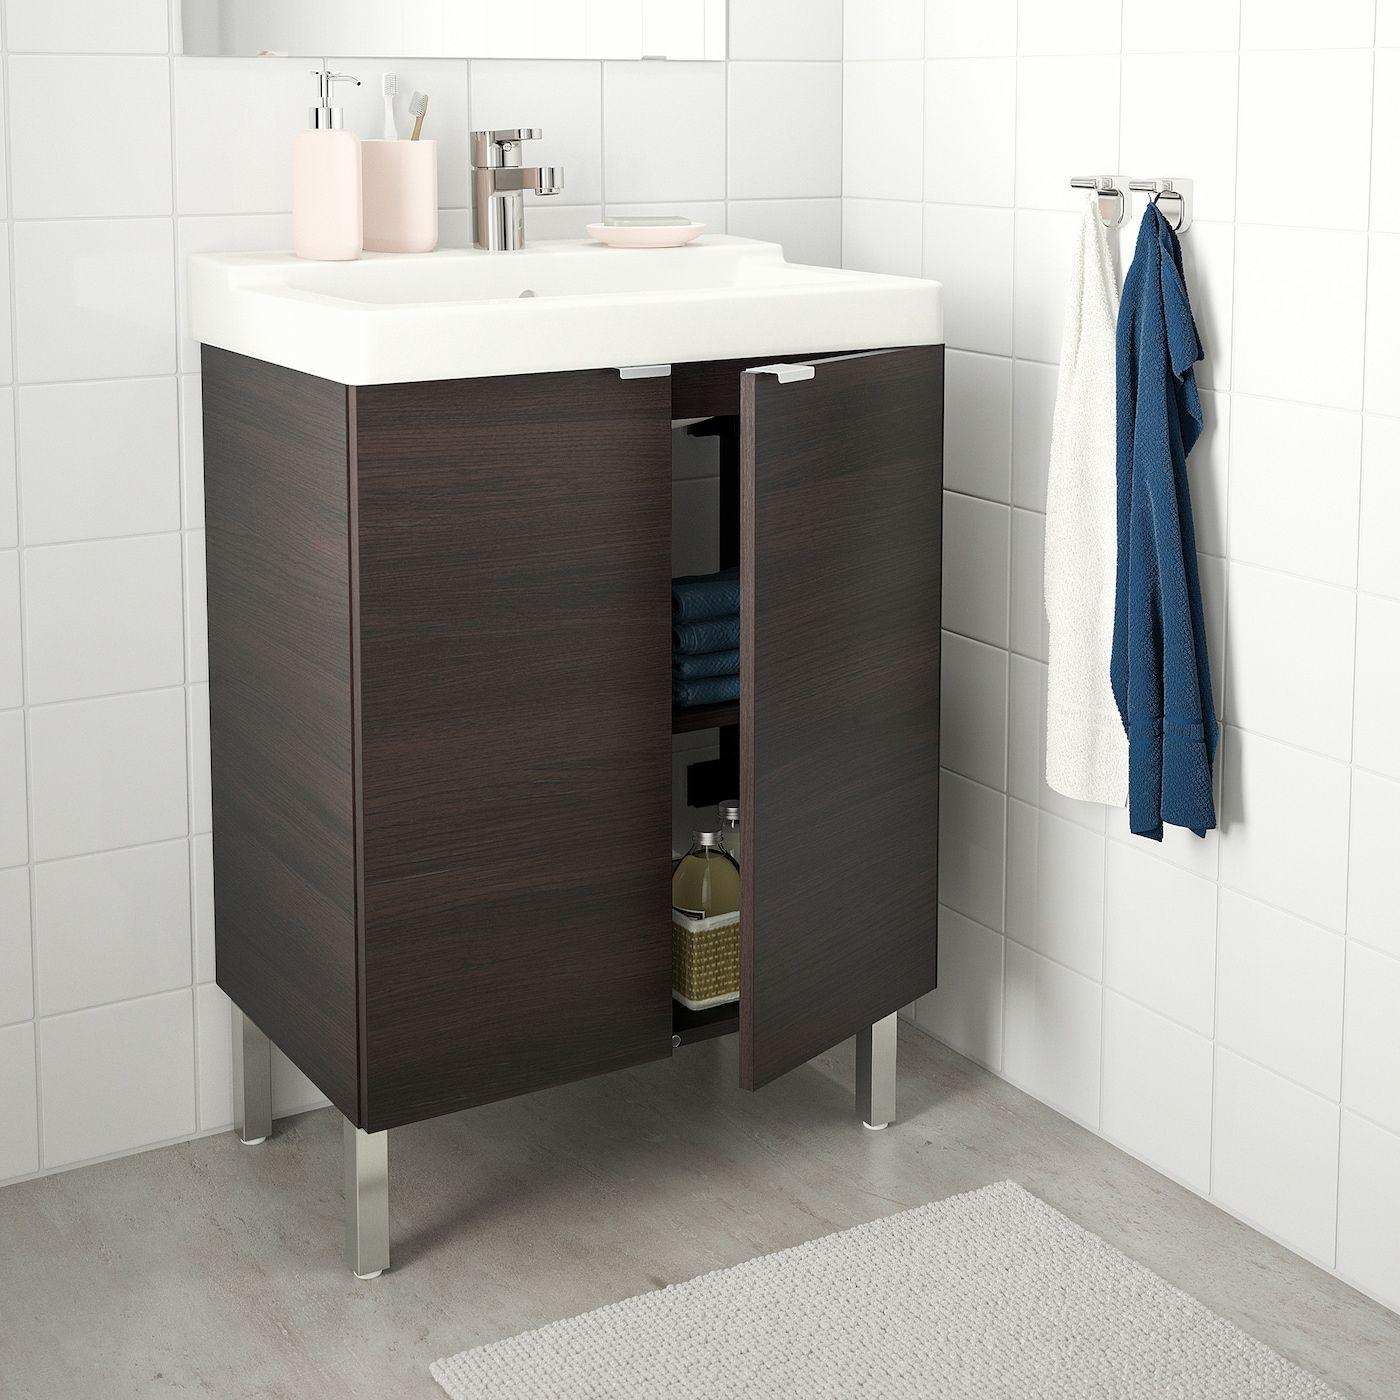 IKEA LILLÅNGEN / TÄLLEVIKEN Bathroom vanity w 2 doors i